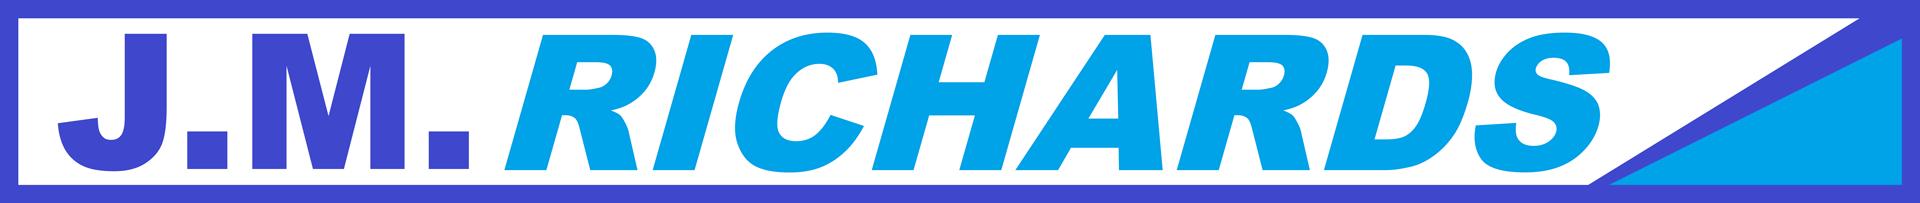 richards cycles logo